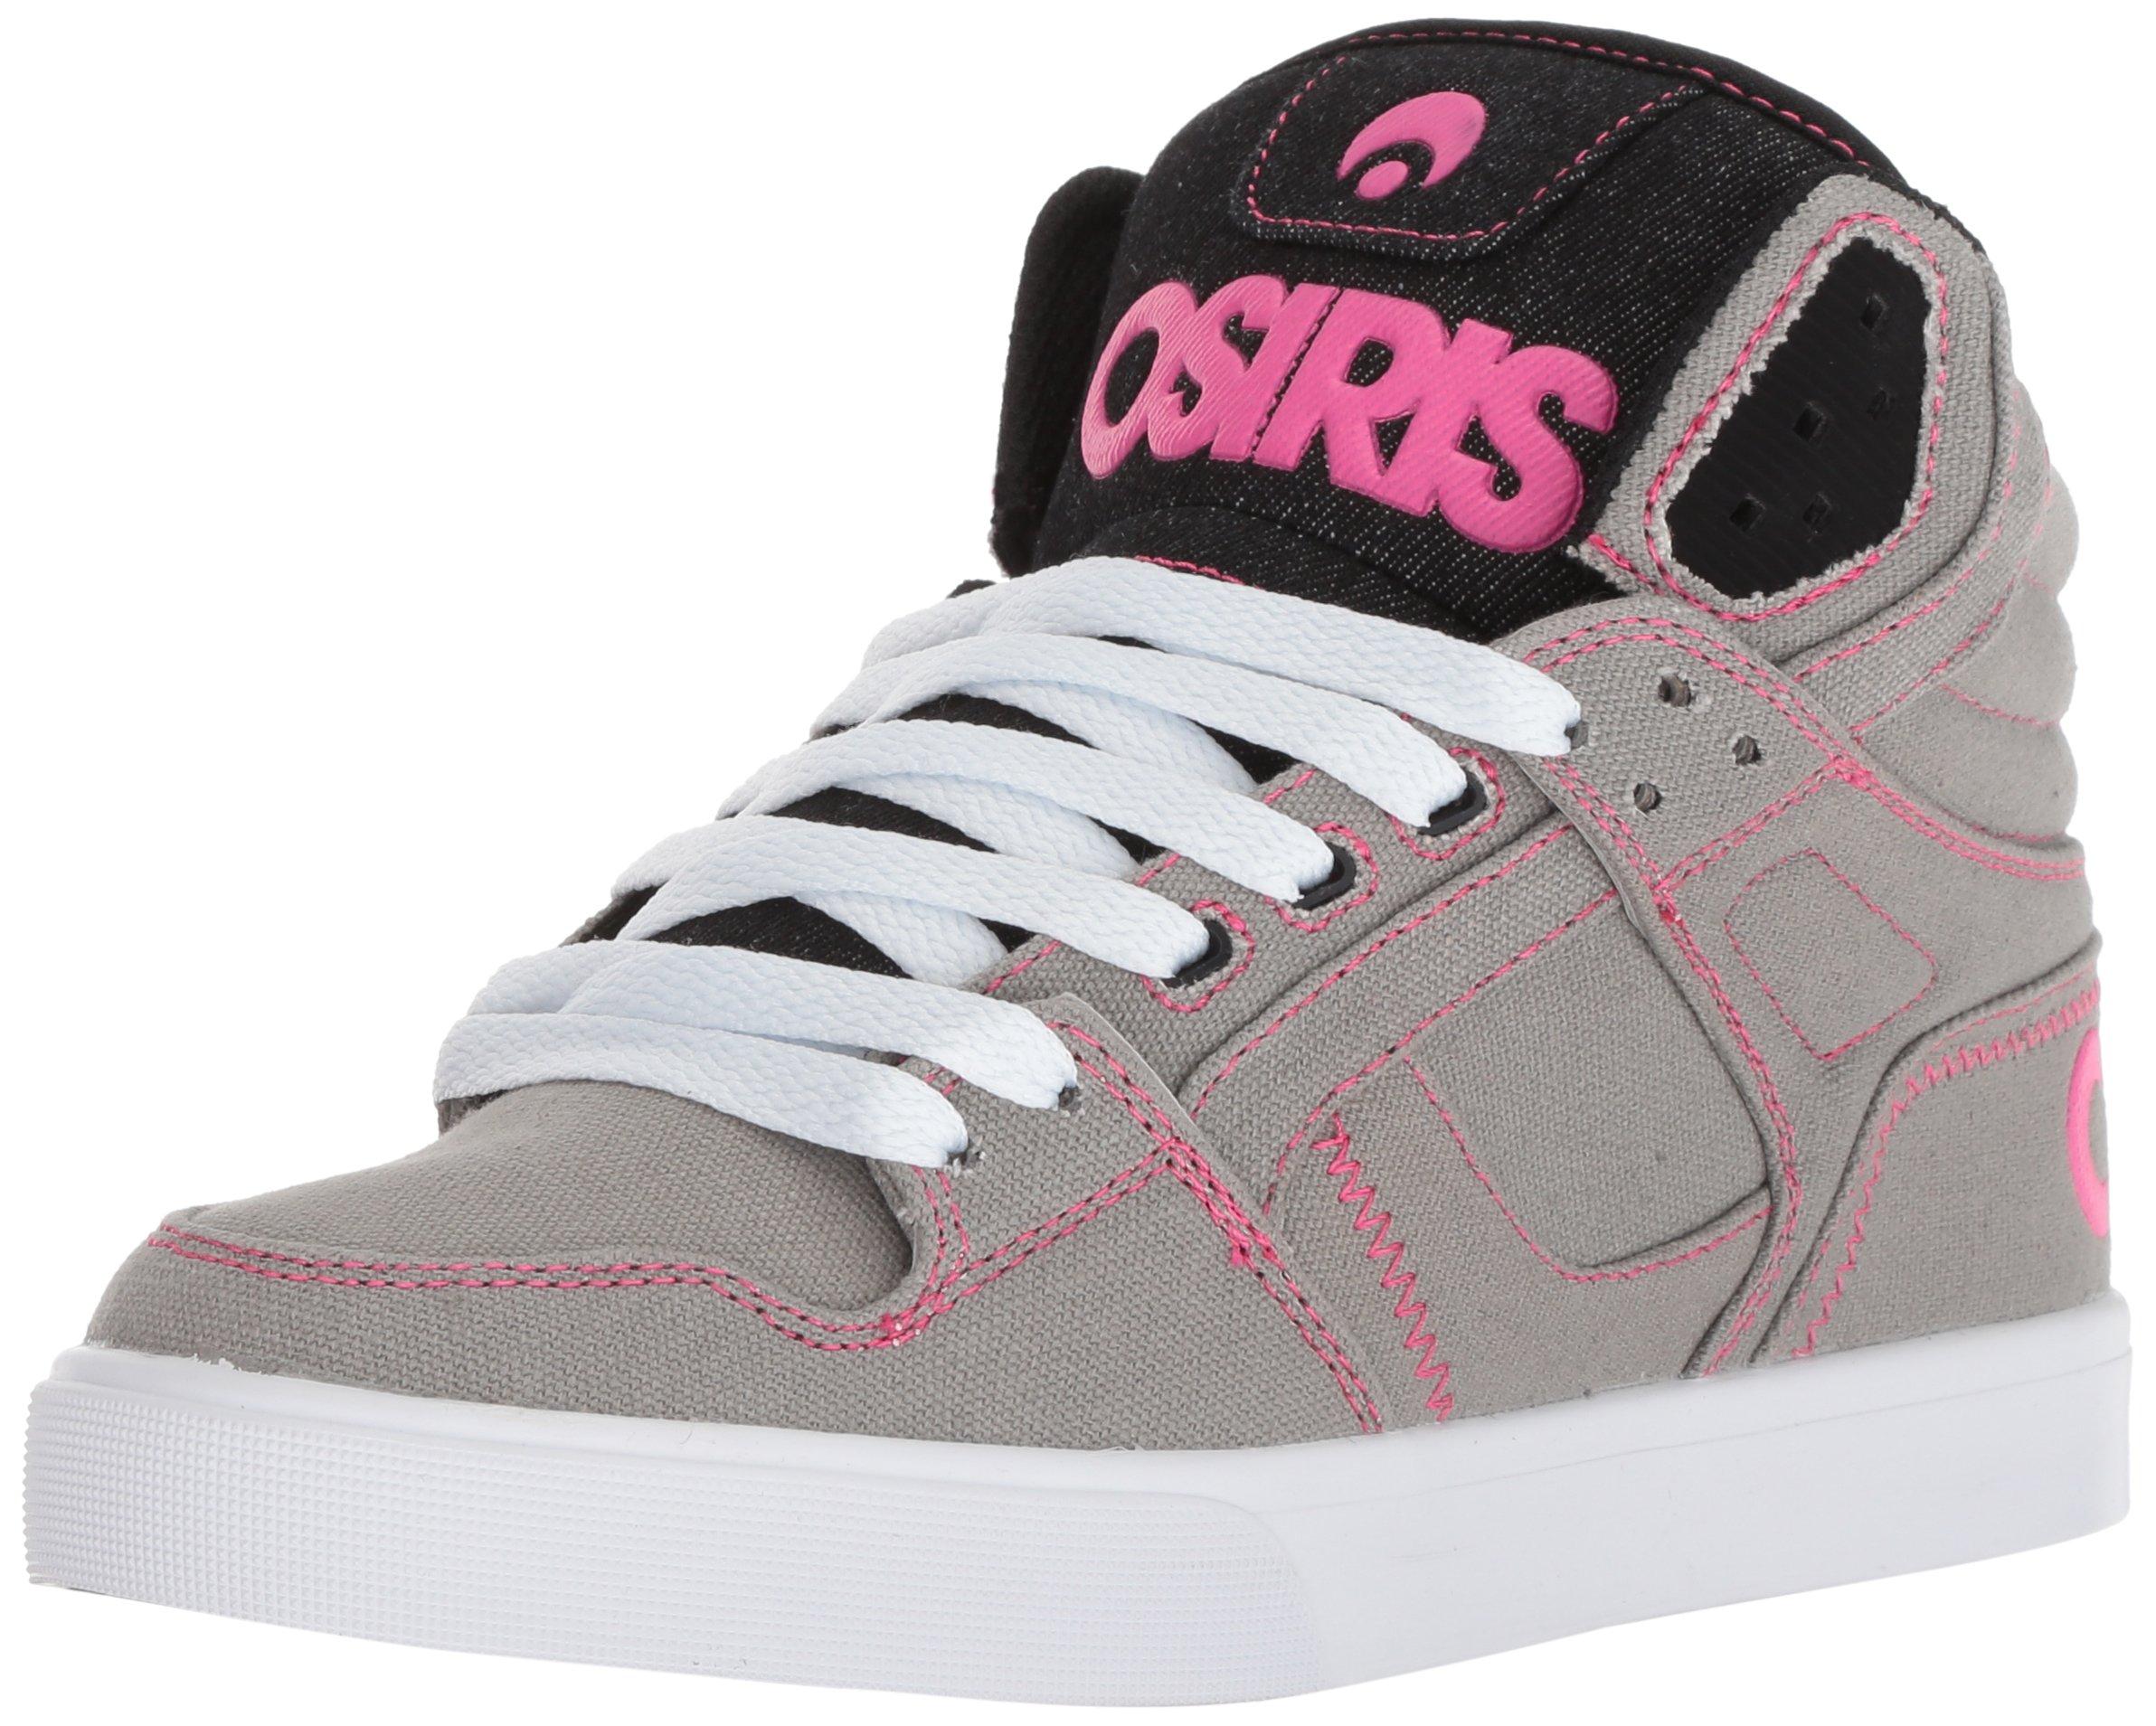 Osiris Women's Clone Skate Shoe, Grey/White/Pink, 9 M US by Osiris